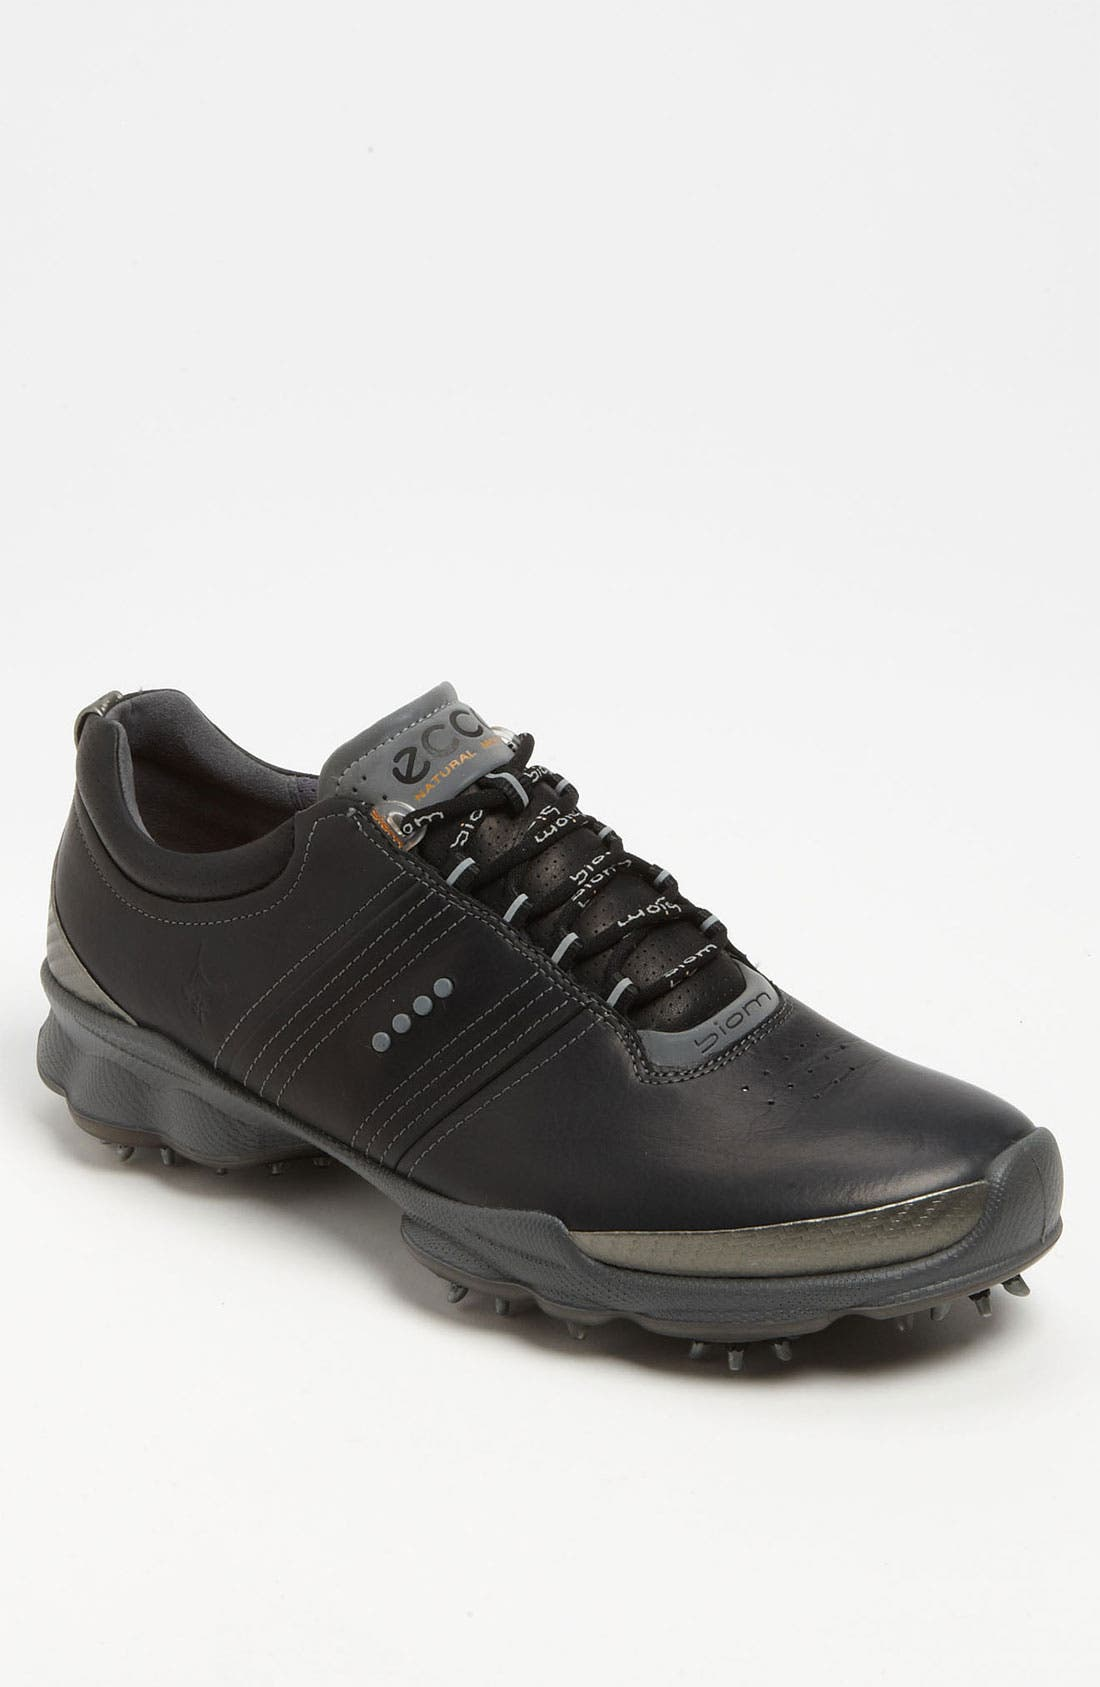 Alternate Image 1 Selected - ECCO 'Biom' Hydromax Golf Shoe (Men)